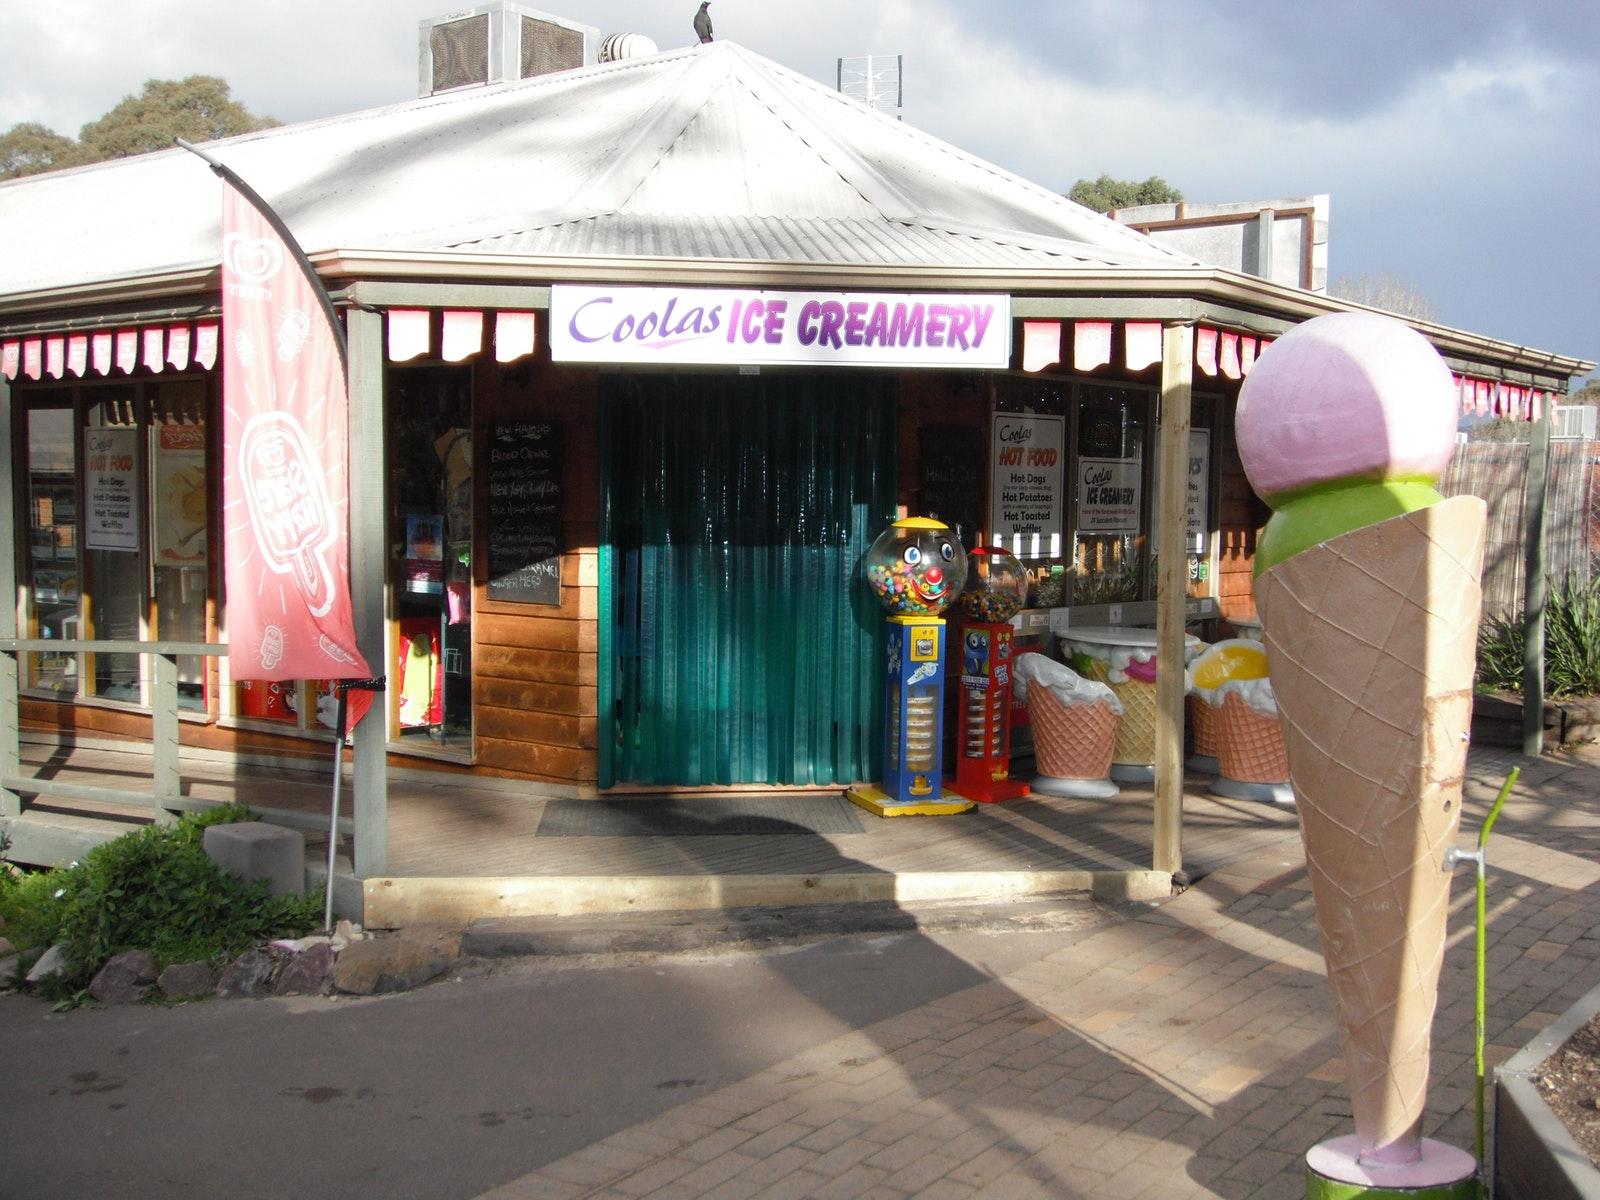 Entrance to Coolas Ice Creamery